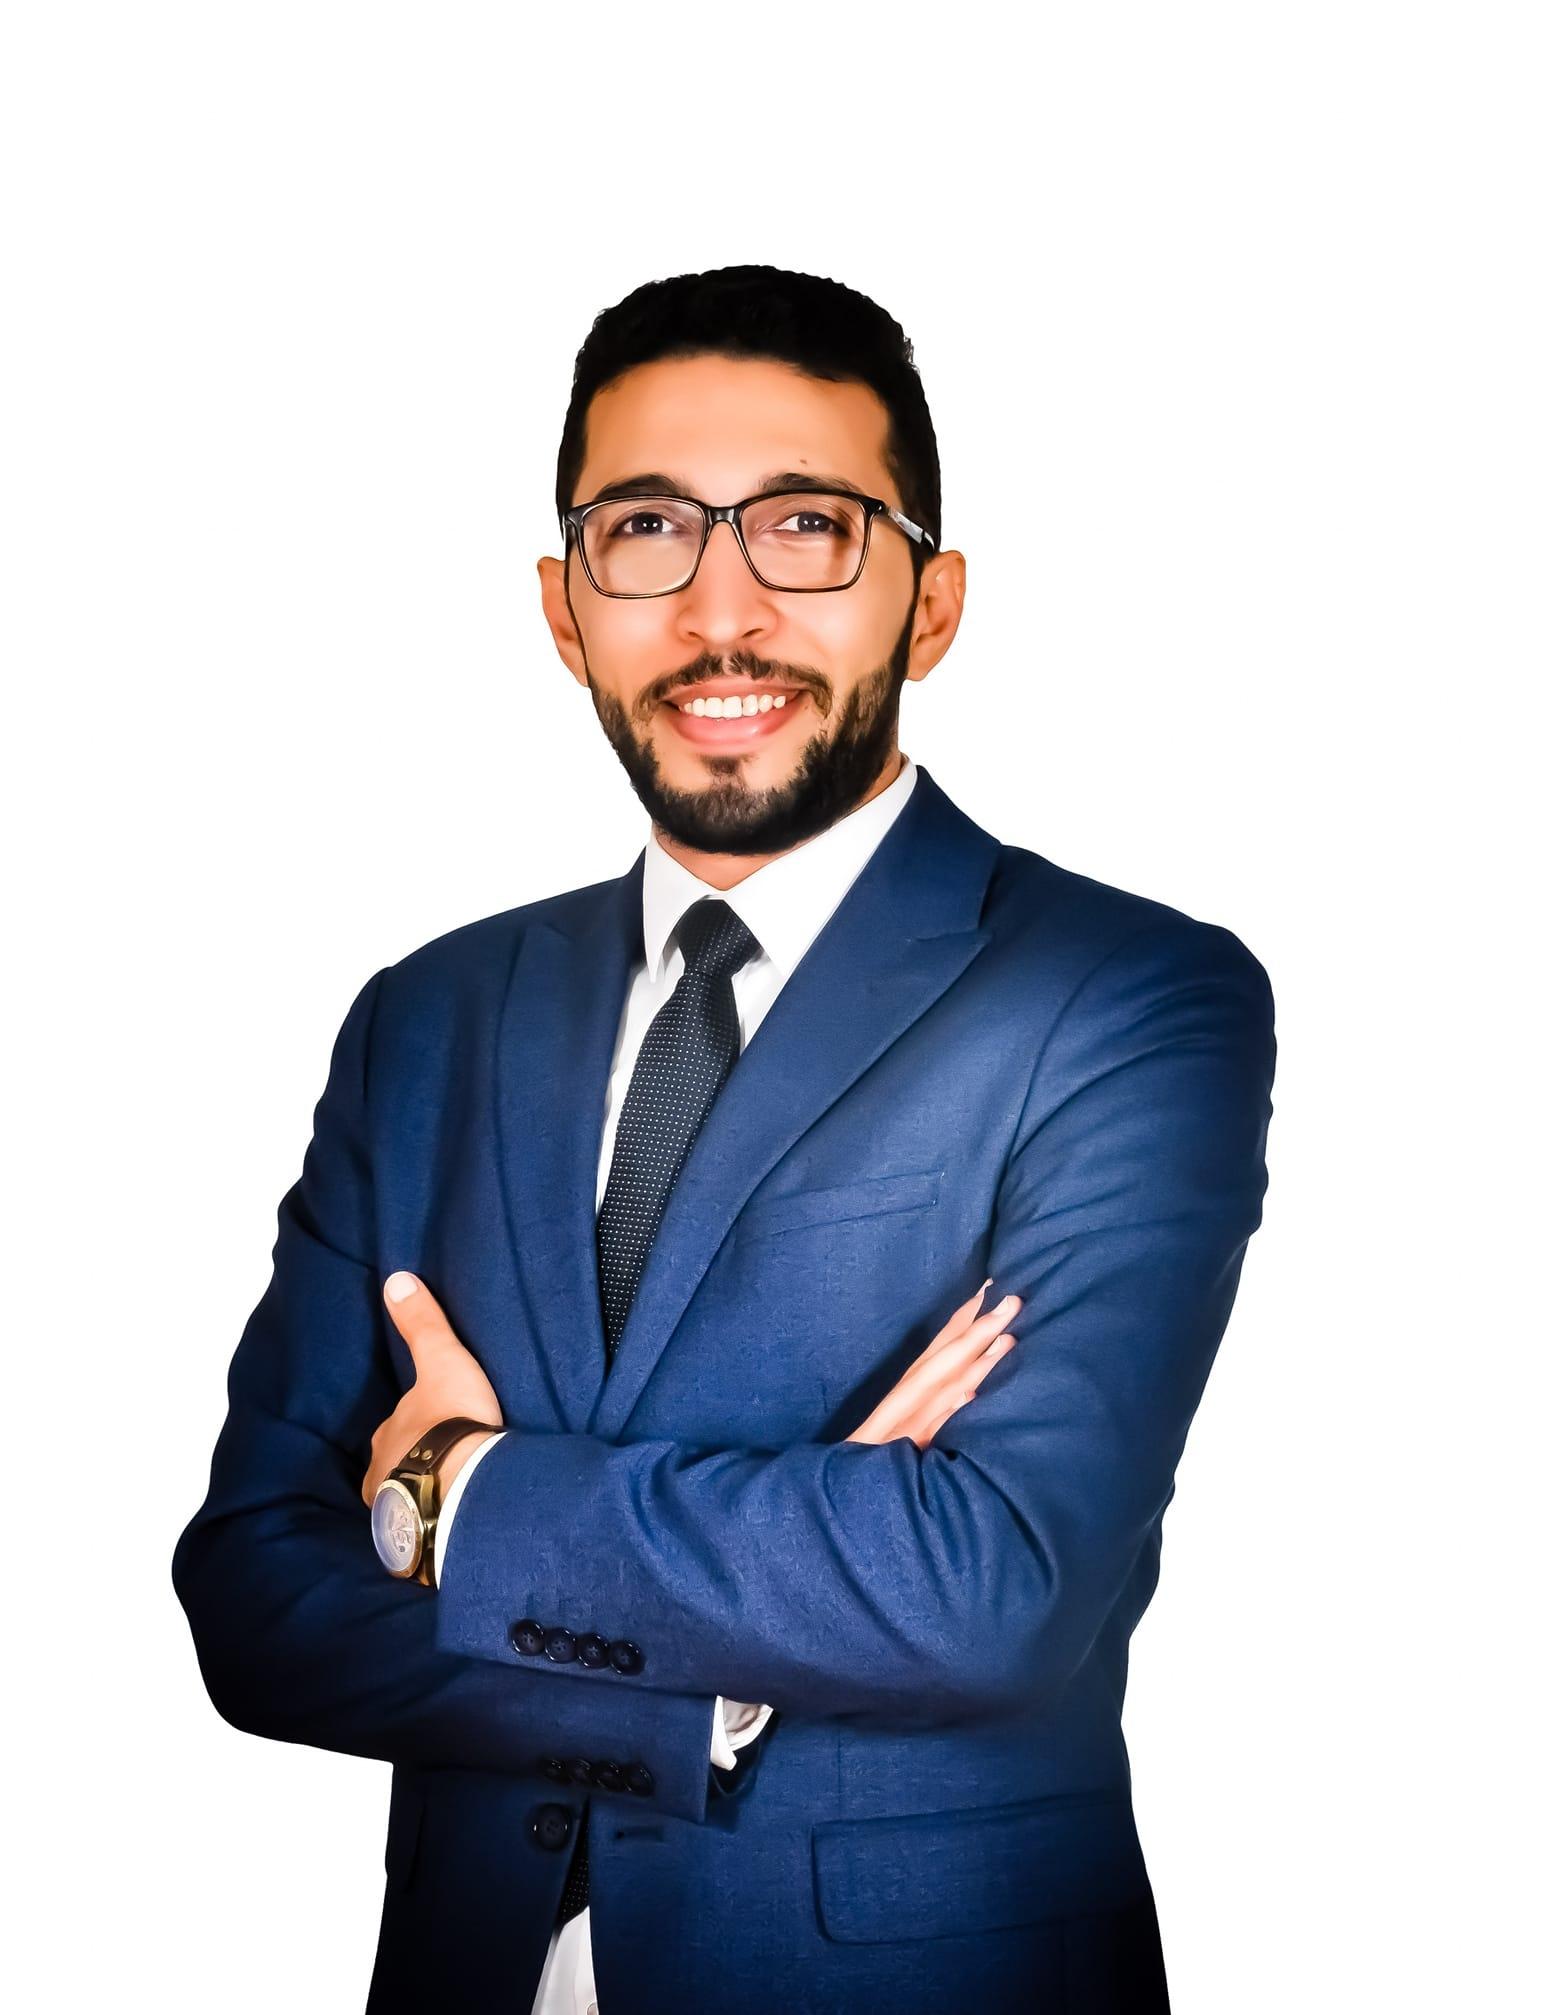 /srv/www/vhosts/user3101/html/entrepreneurship-campus.org/wp-content/uploads/2021/06/Yassine-Bentaleb-1.jpg